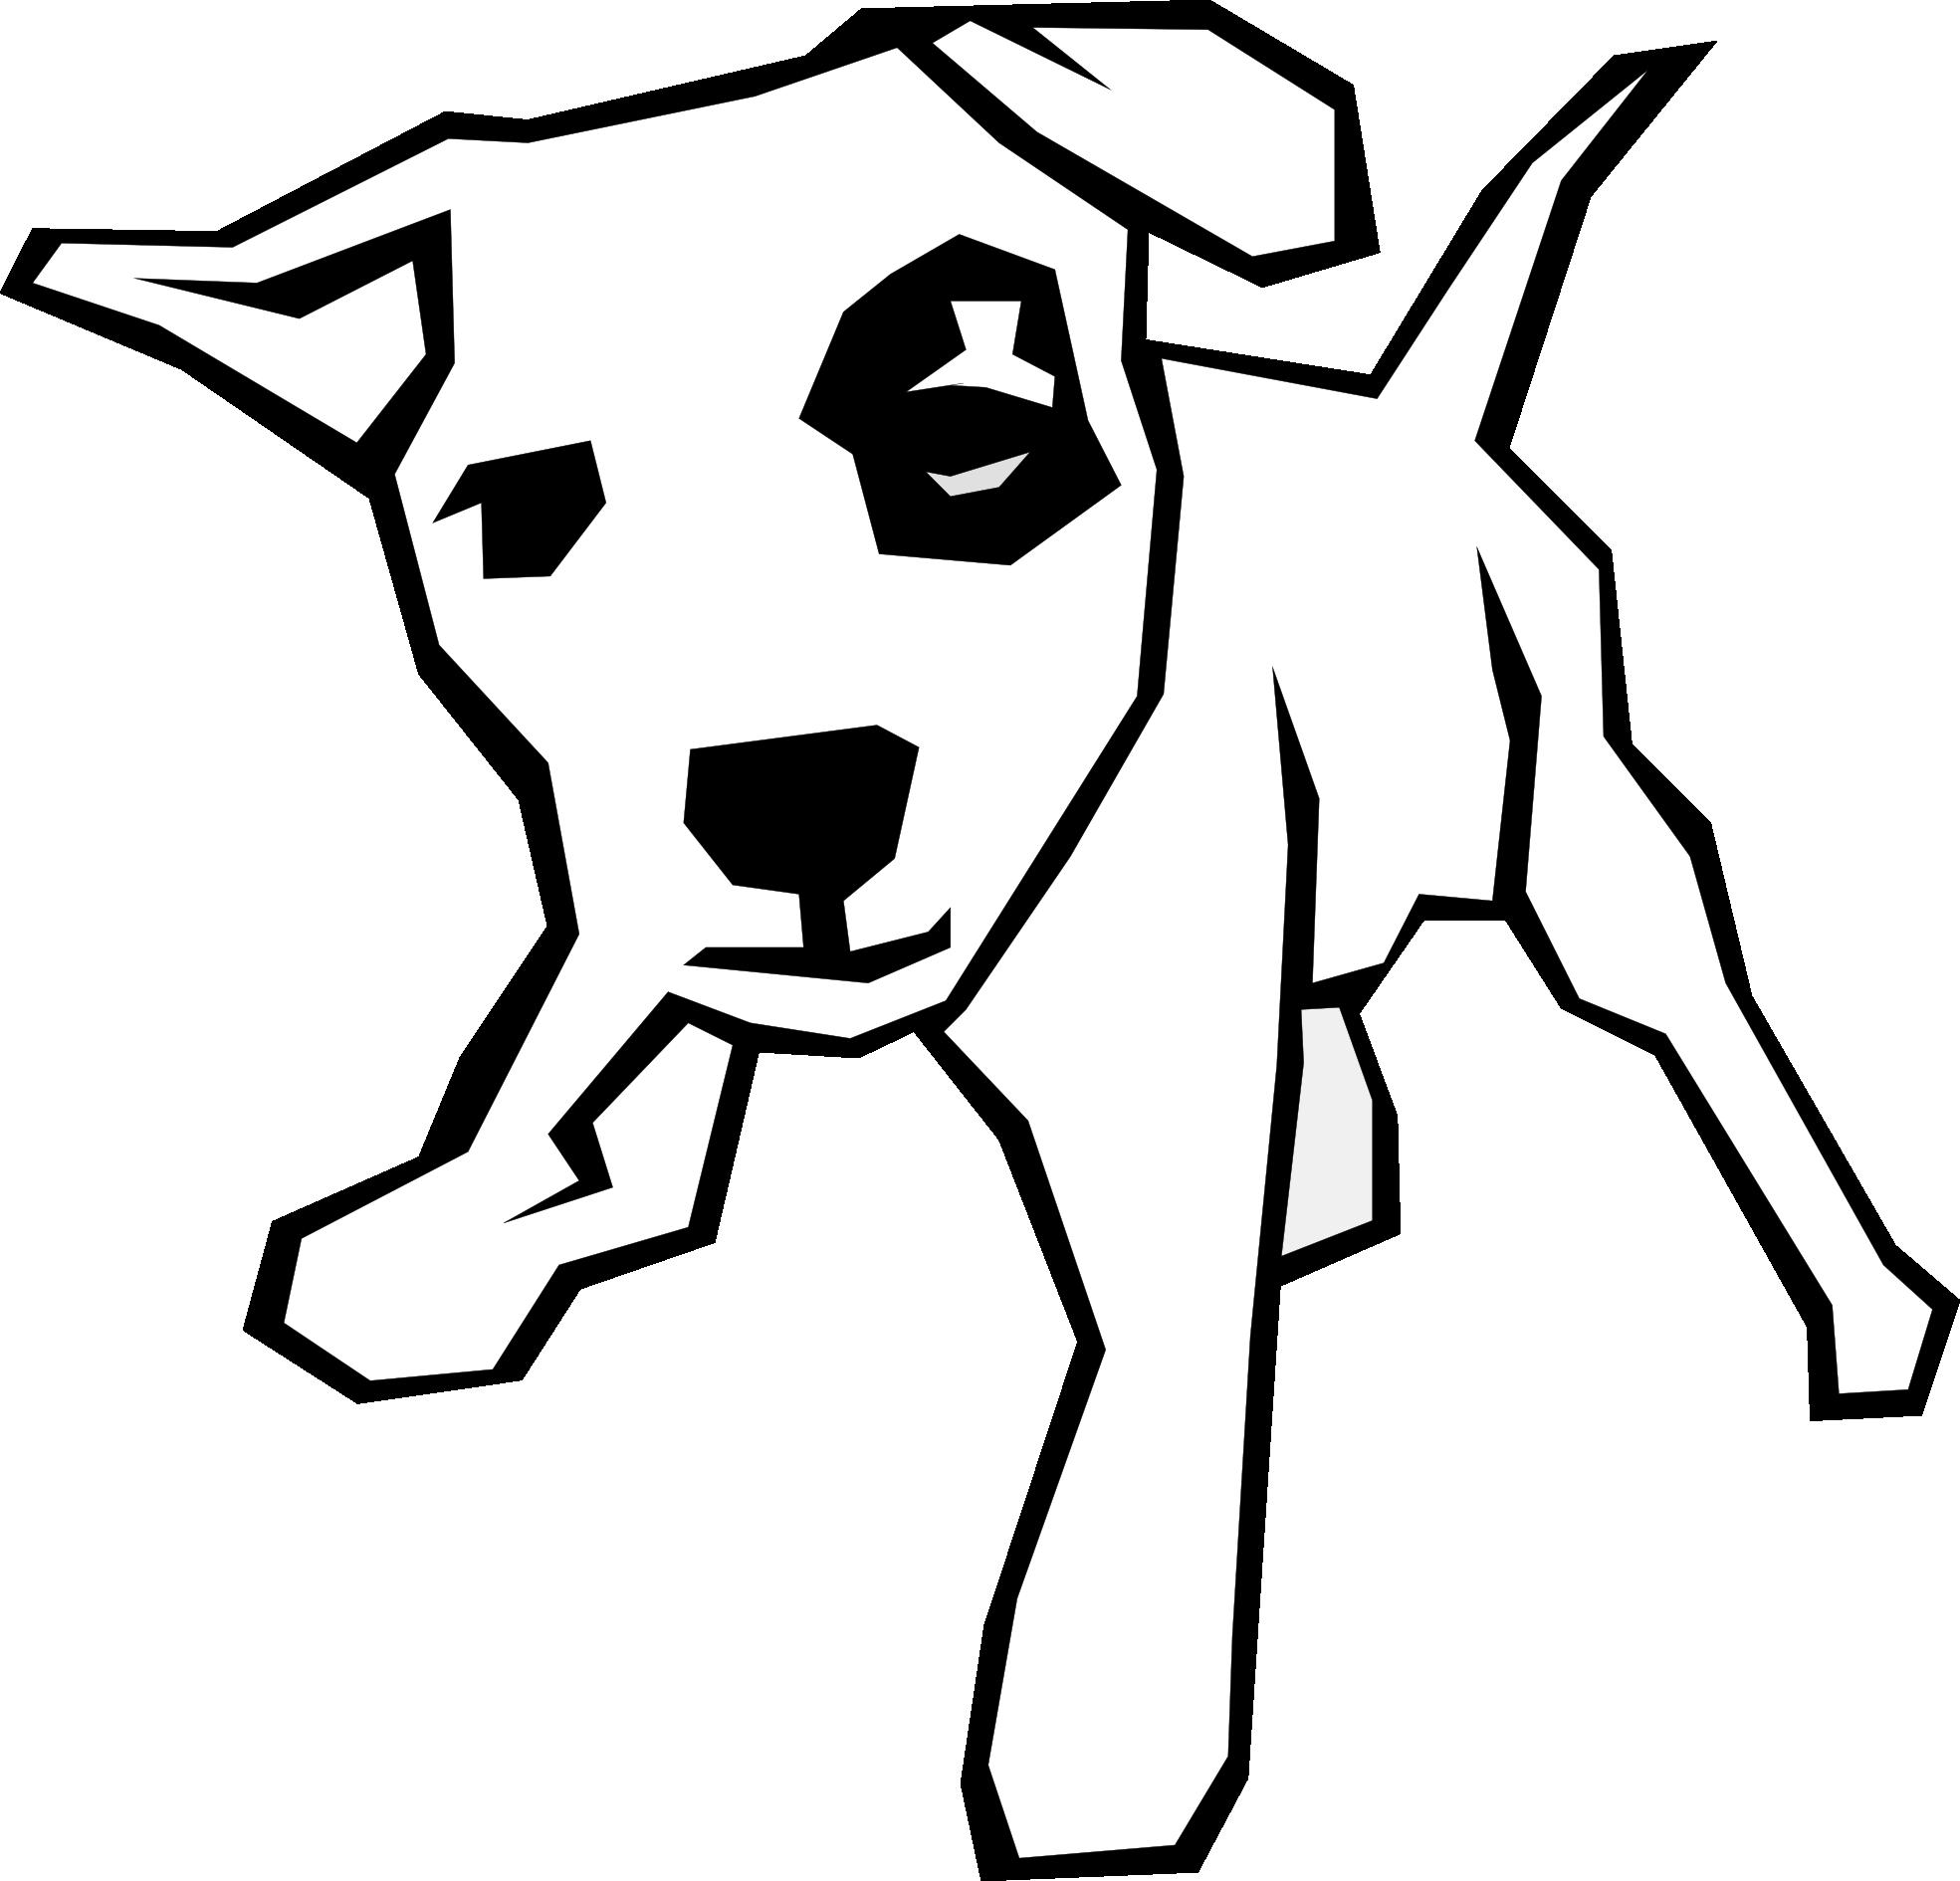 Kangaroo clipart black and white. Dog bone clip art